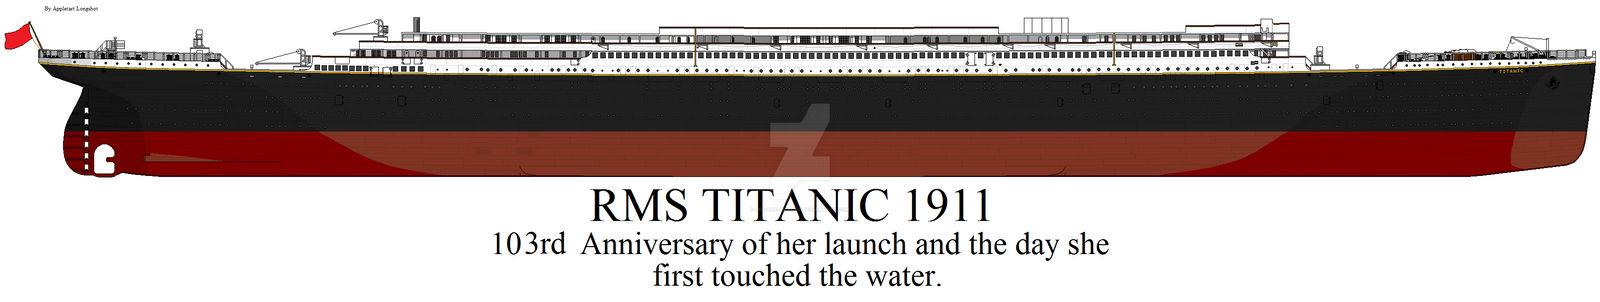 Launch Day Titanic